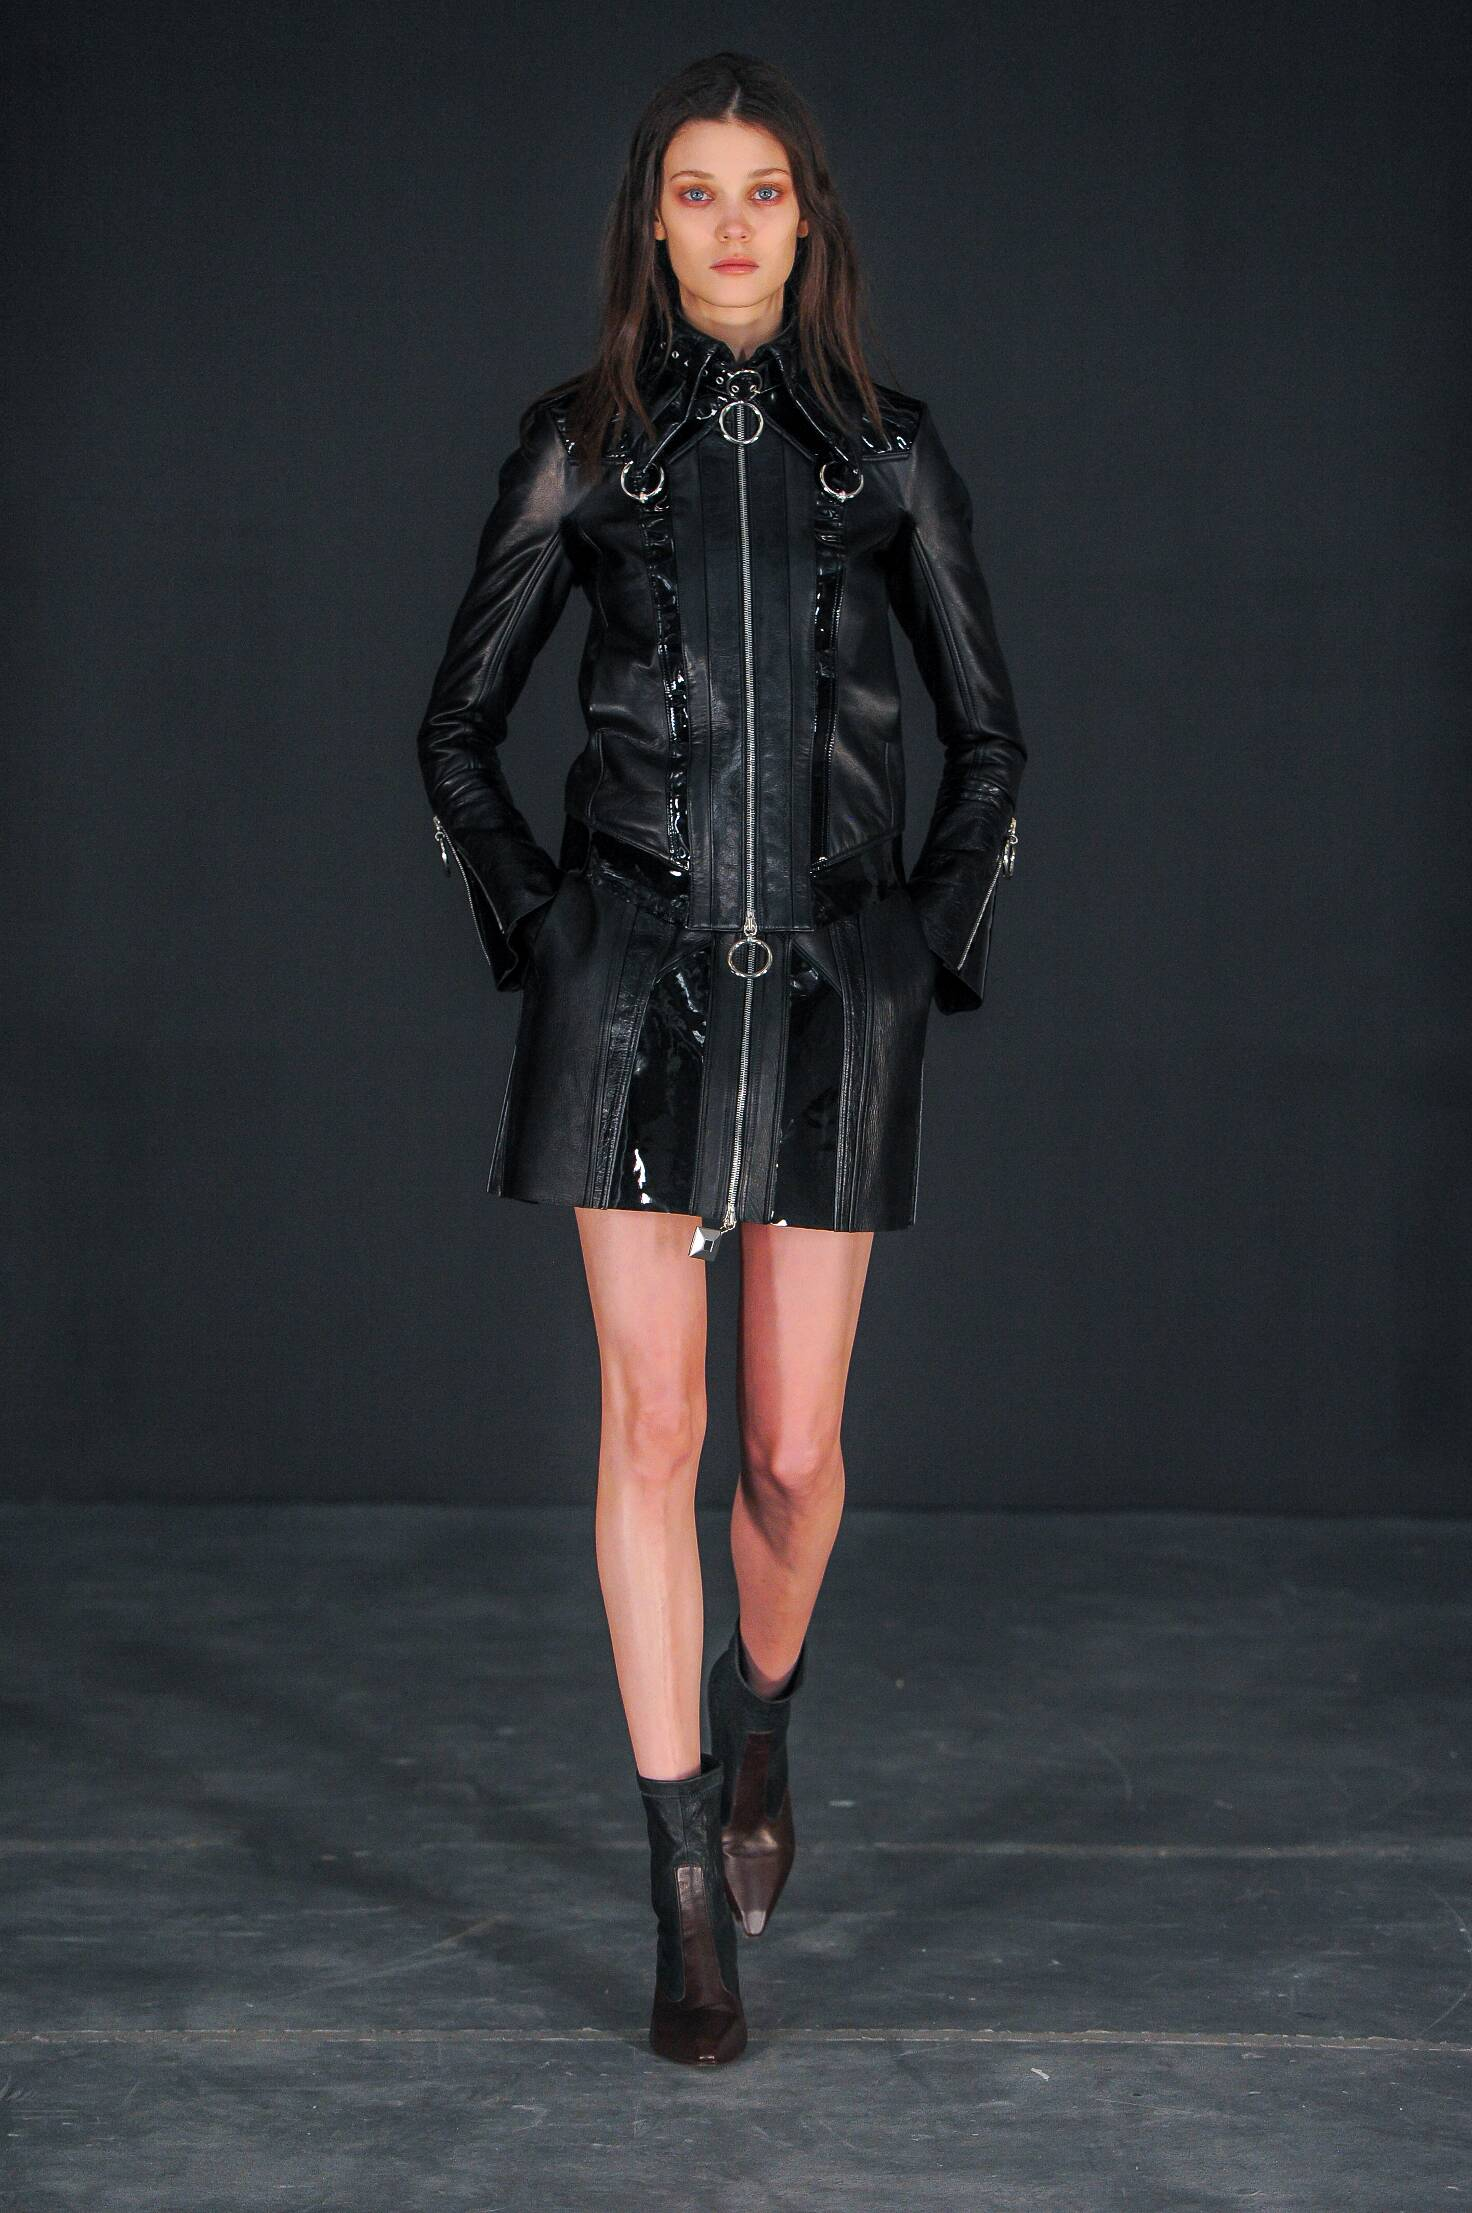 Catwalk Thomas Tait Womenswear Collection Winter 2015